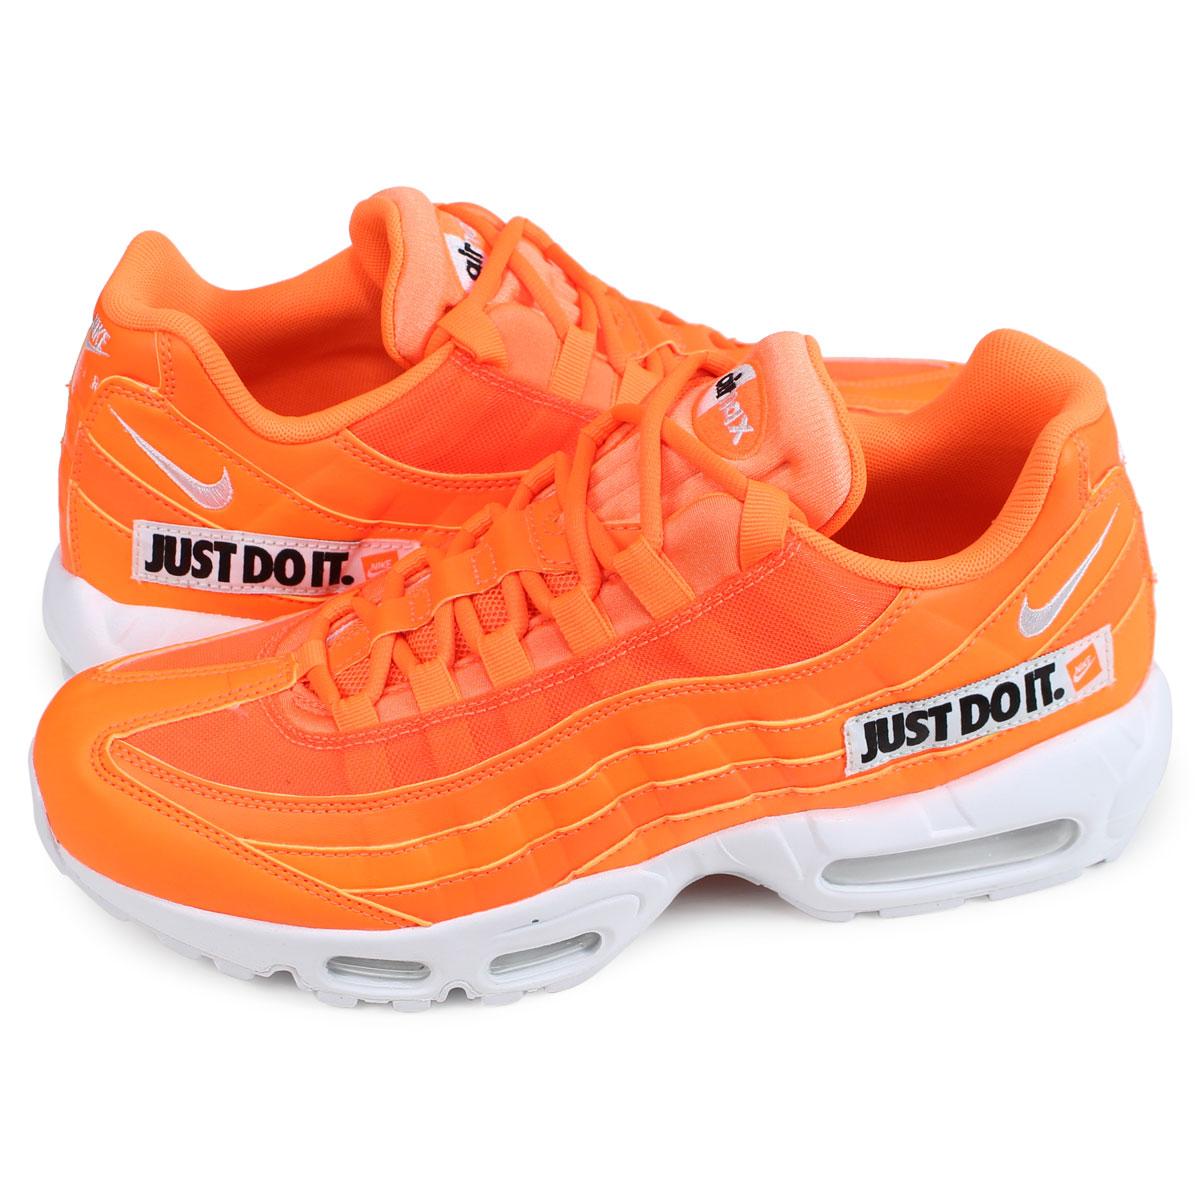 5eb87dd08a Nike NIKE Air Max 95 sneakers men AIR MAX 95 SE JUST DO IT orange AV6246